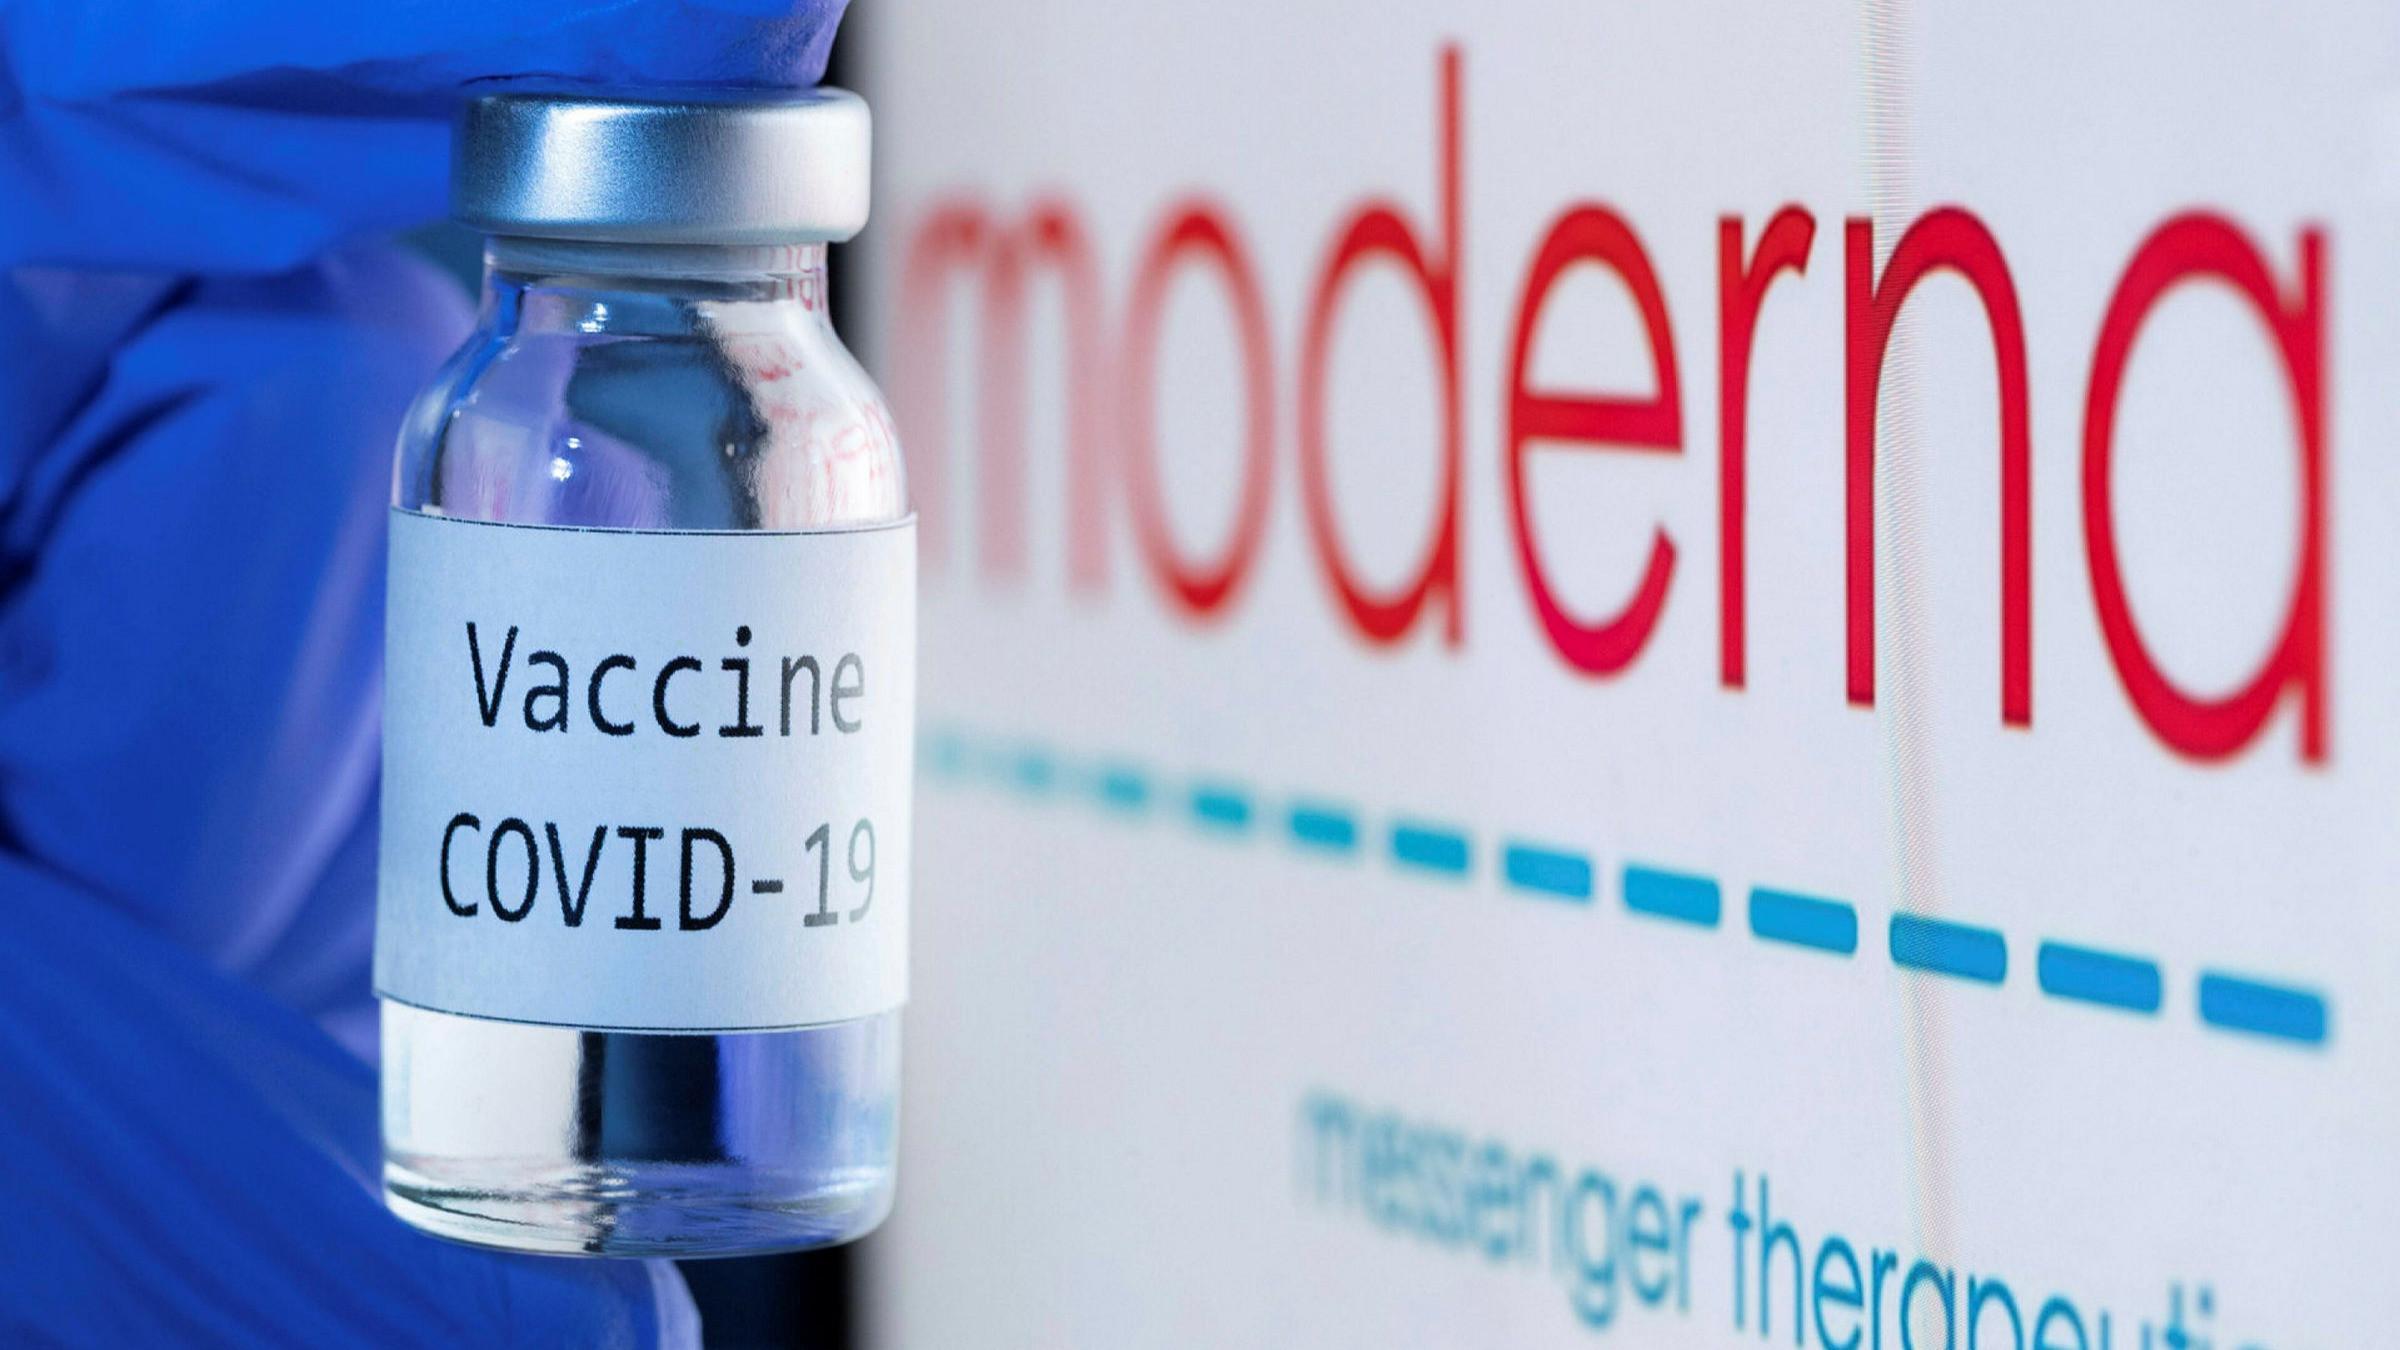 The Moderna COVID-19 (mRNA-1273) vaccine